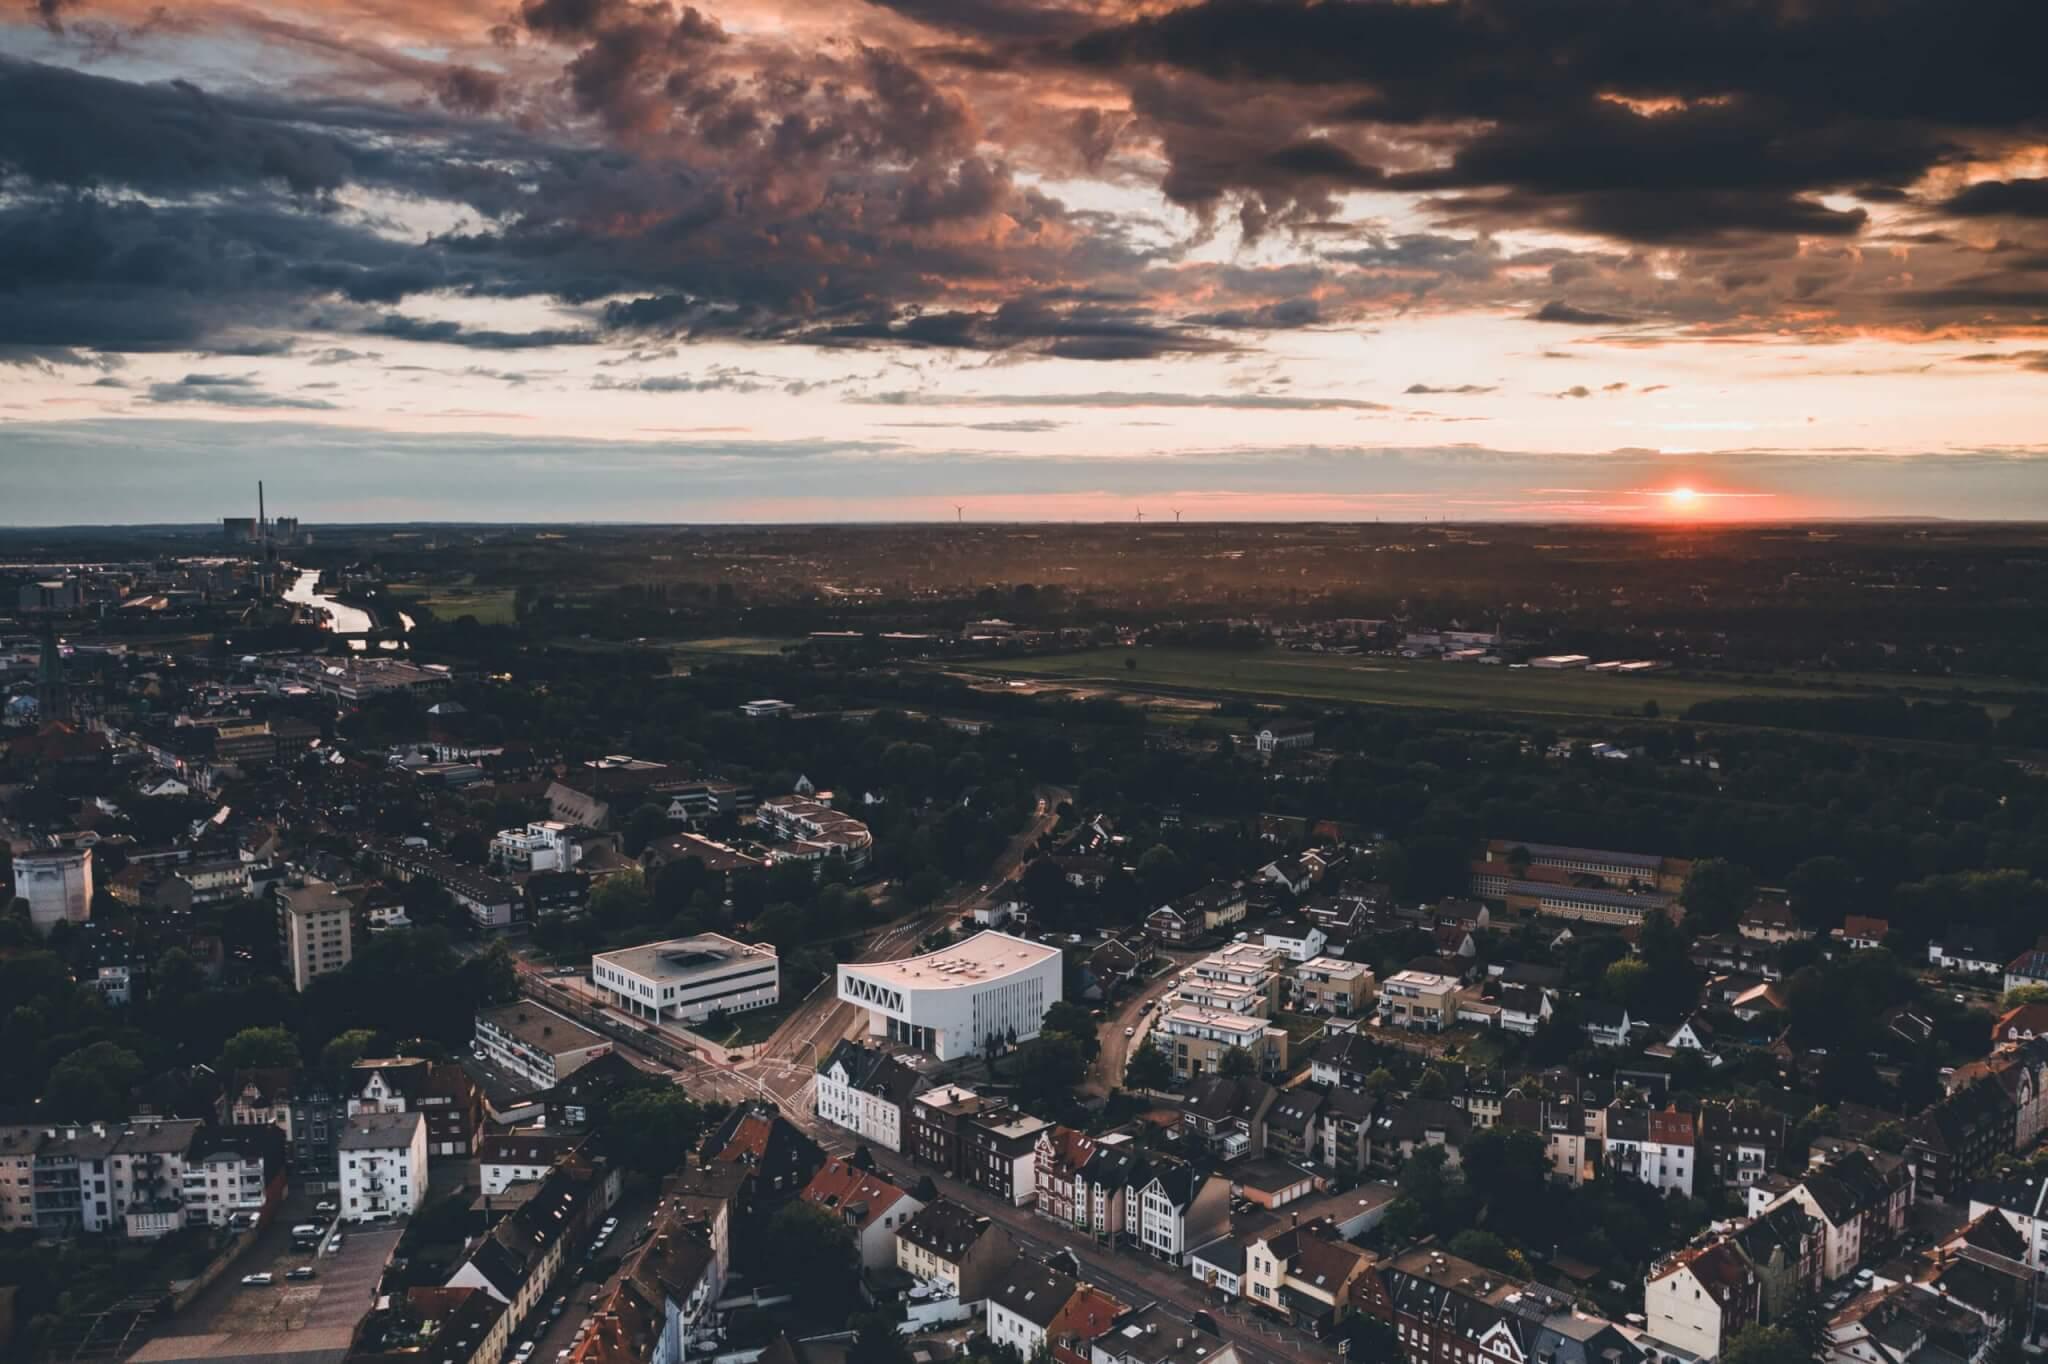 Sonnenuntergang über Hamm